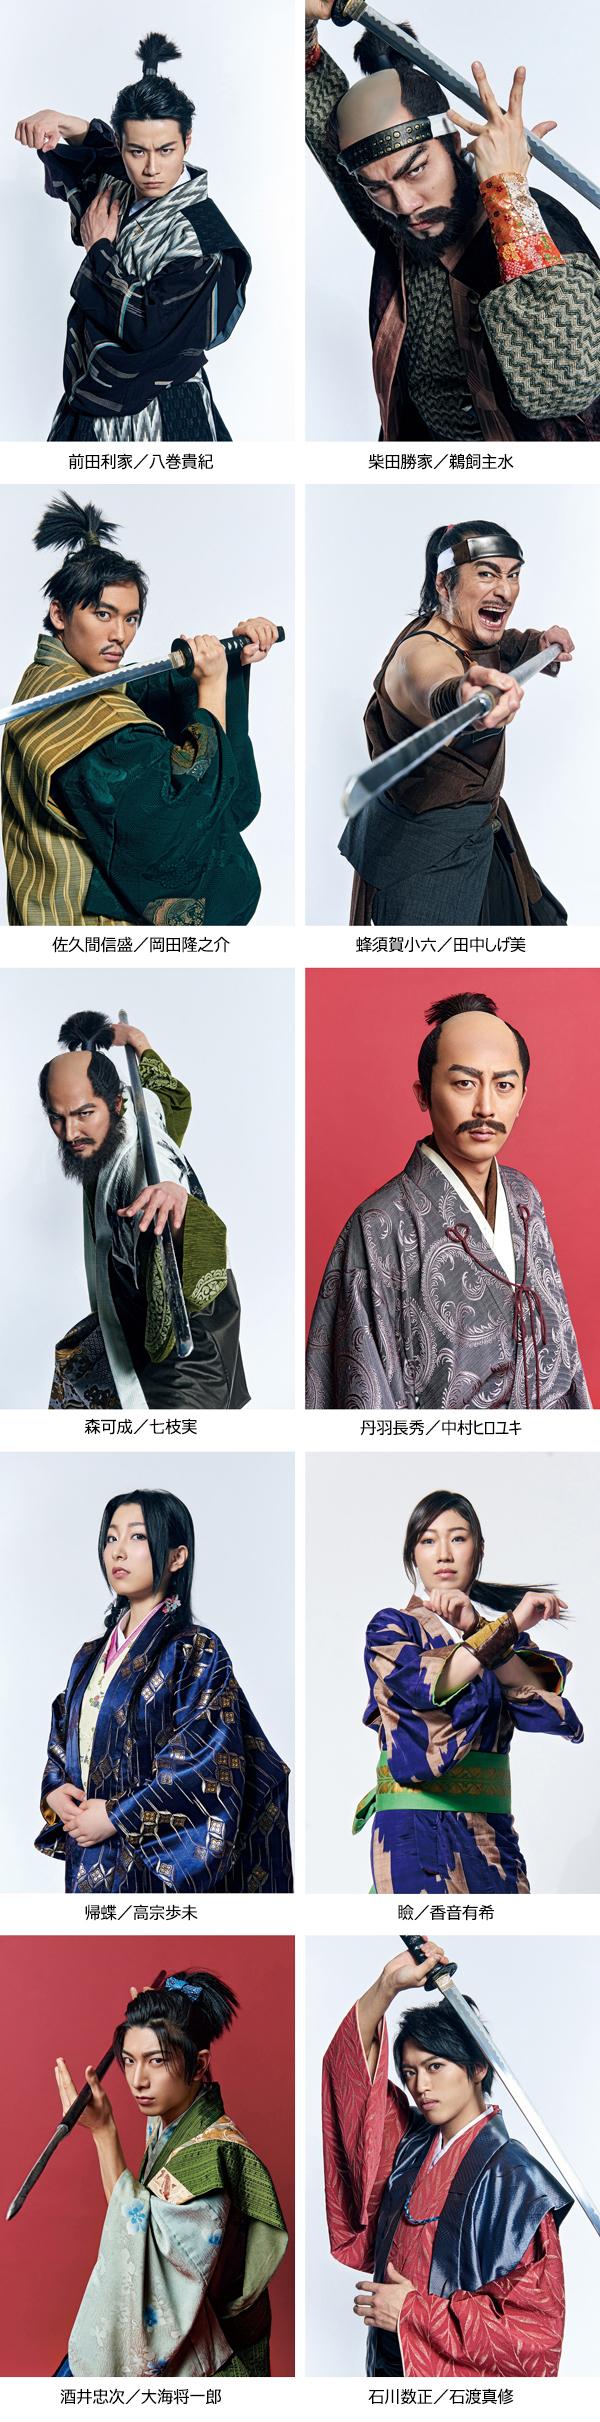 butai_nobunaganoyabou_haru_cast2-1.jpg